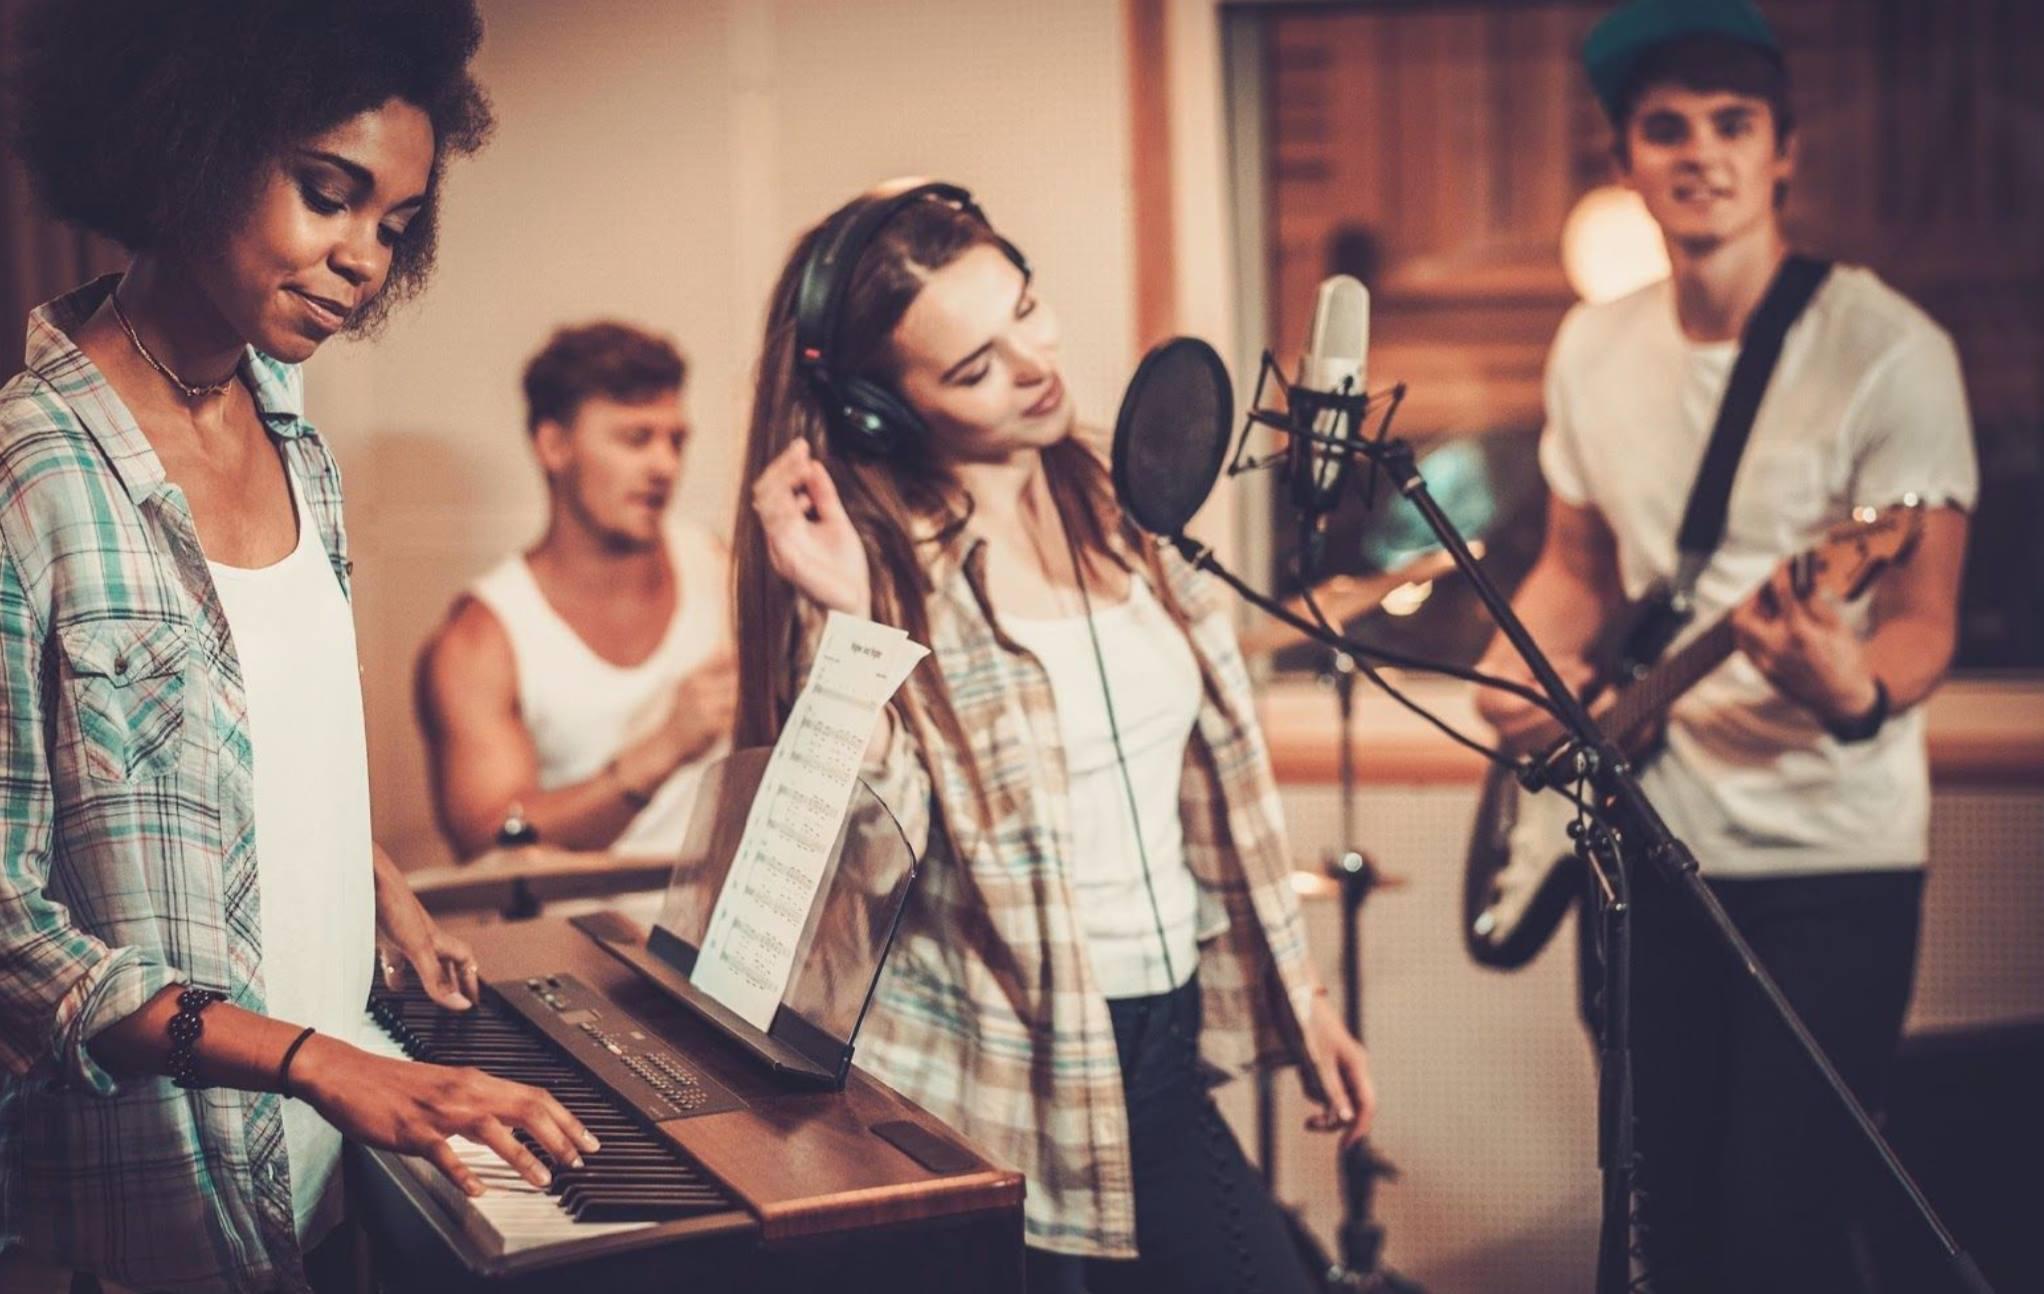 Soundcheck dating een muzikant